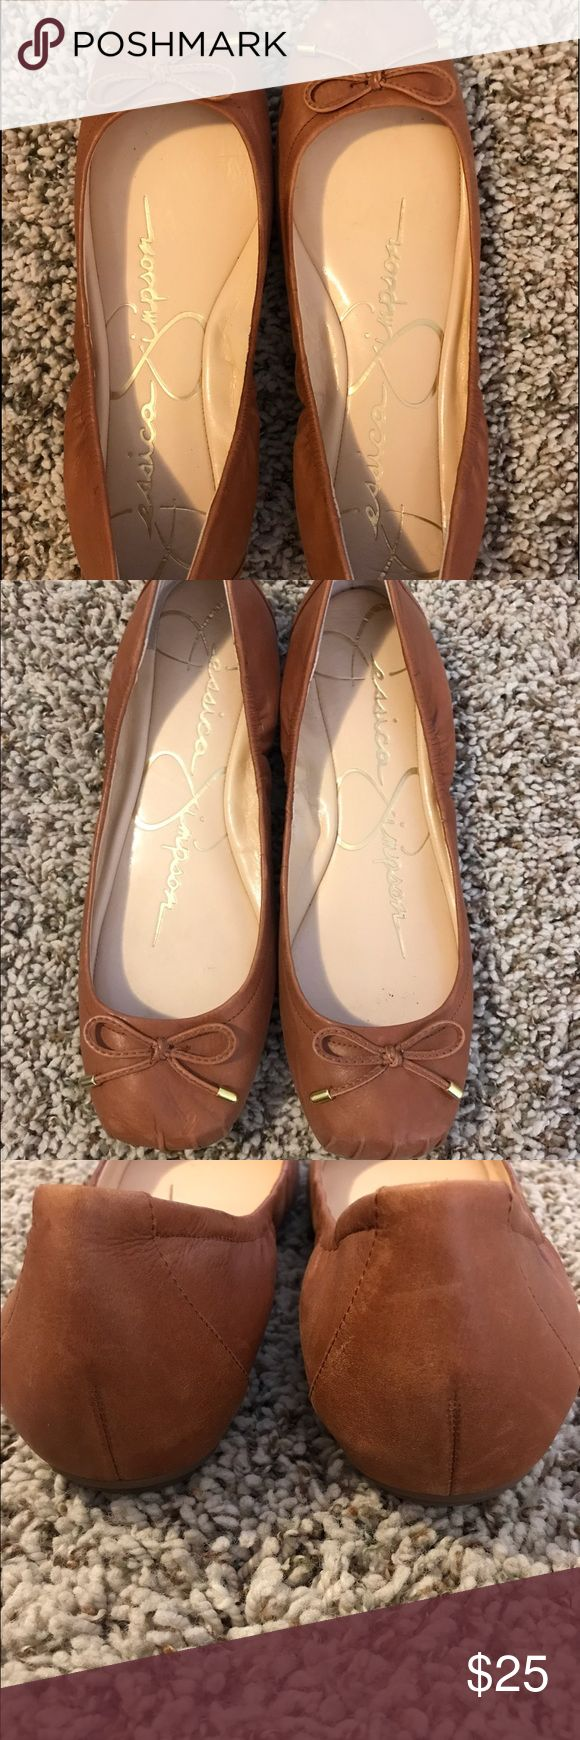 Women's Jessica Simpson Ballet Flats Jessica Simpson ballet flats! Mint condition! Super comfy and super cute! Cognac color. 8M Jessica Simpson Shoes Flats & Loafers